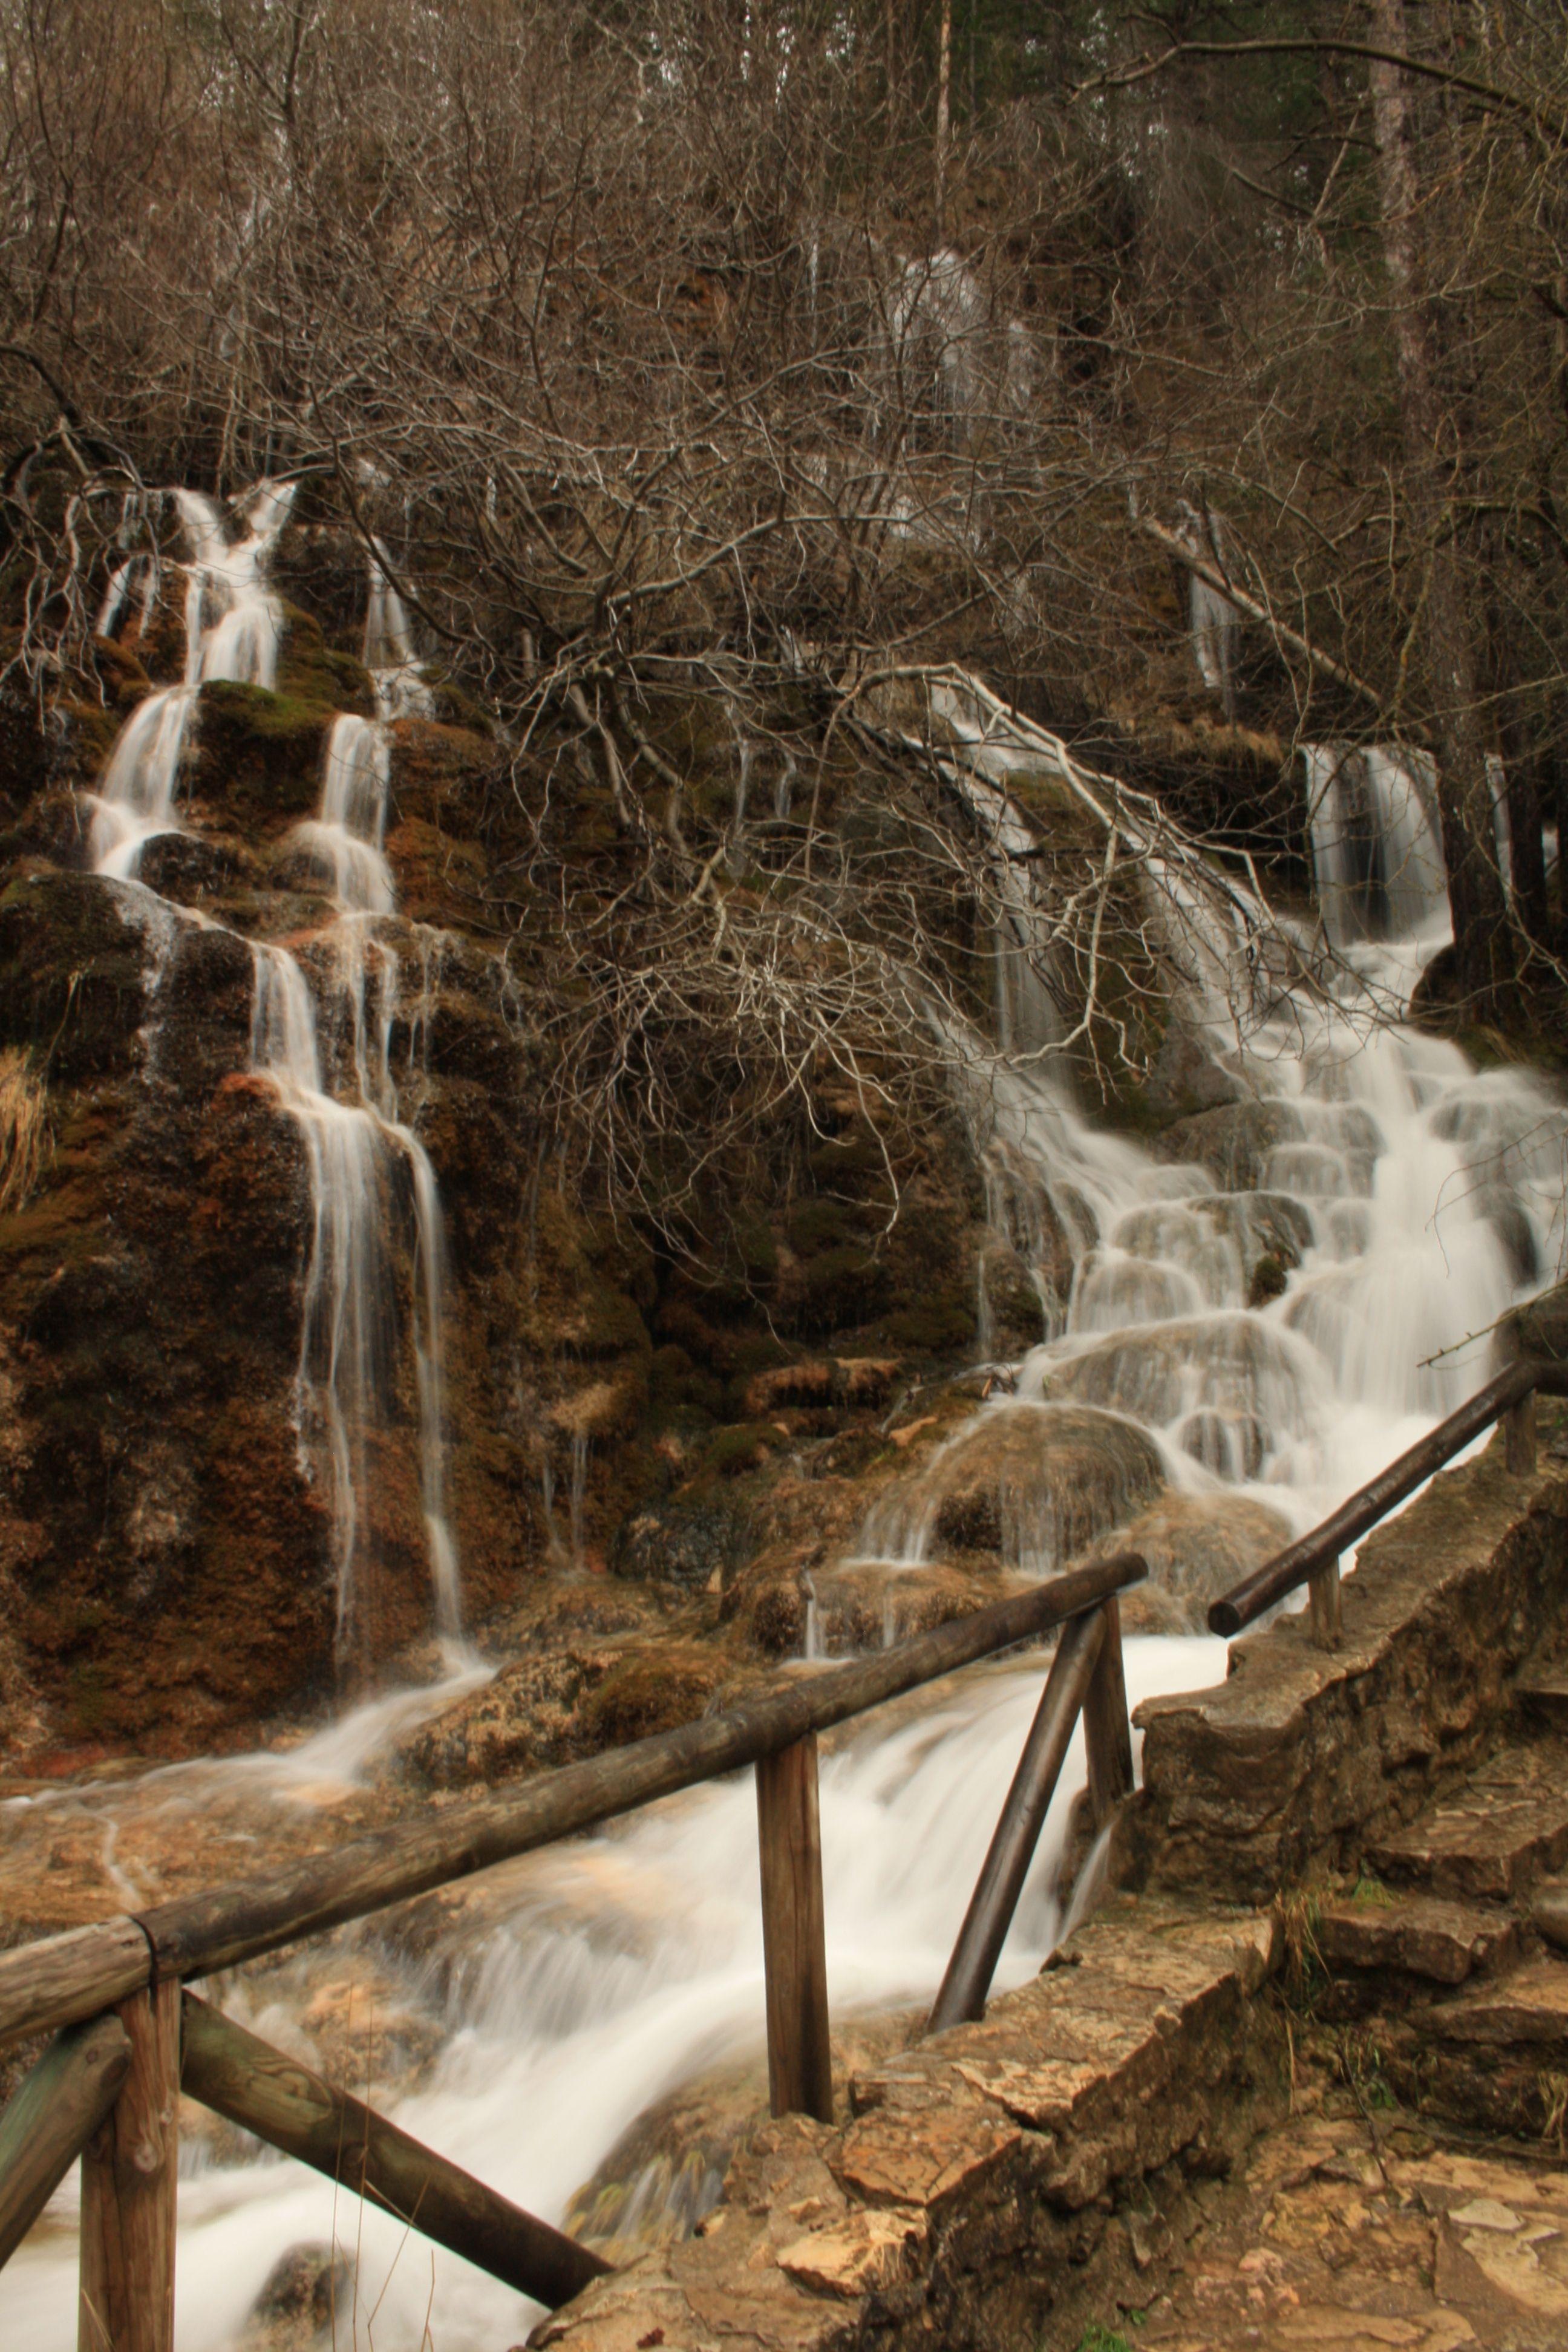 Nacimiento Del Rio Cuervo On The Cm2106 Spain Valleys Scenery Photography Landscapes Rivers Parques Naturales Parques Serrania De Cuenca